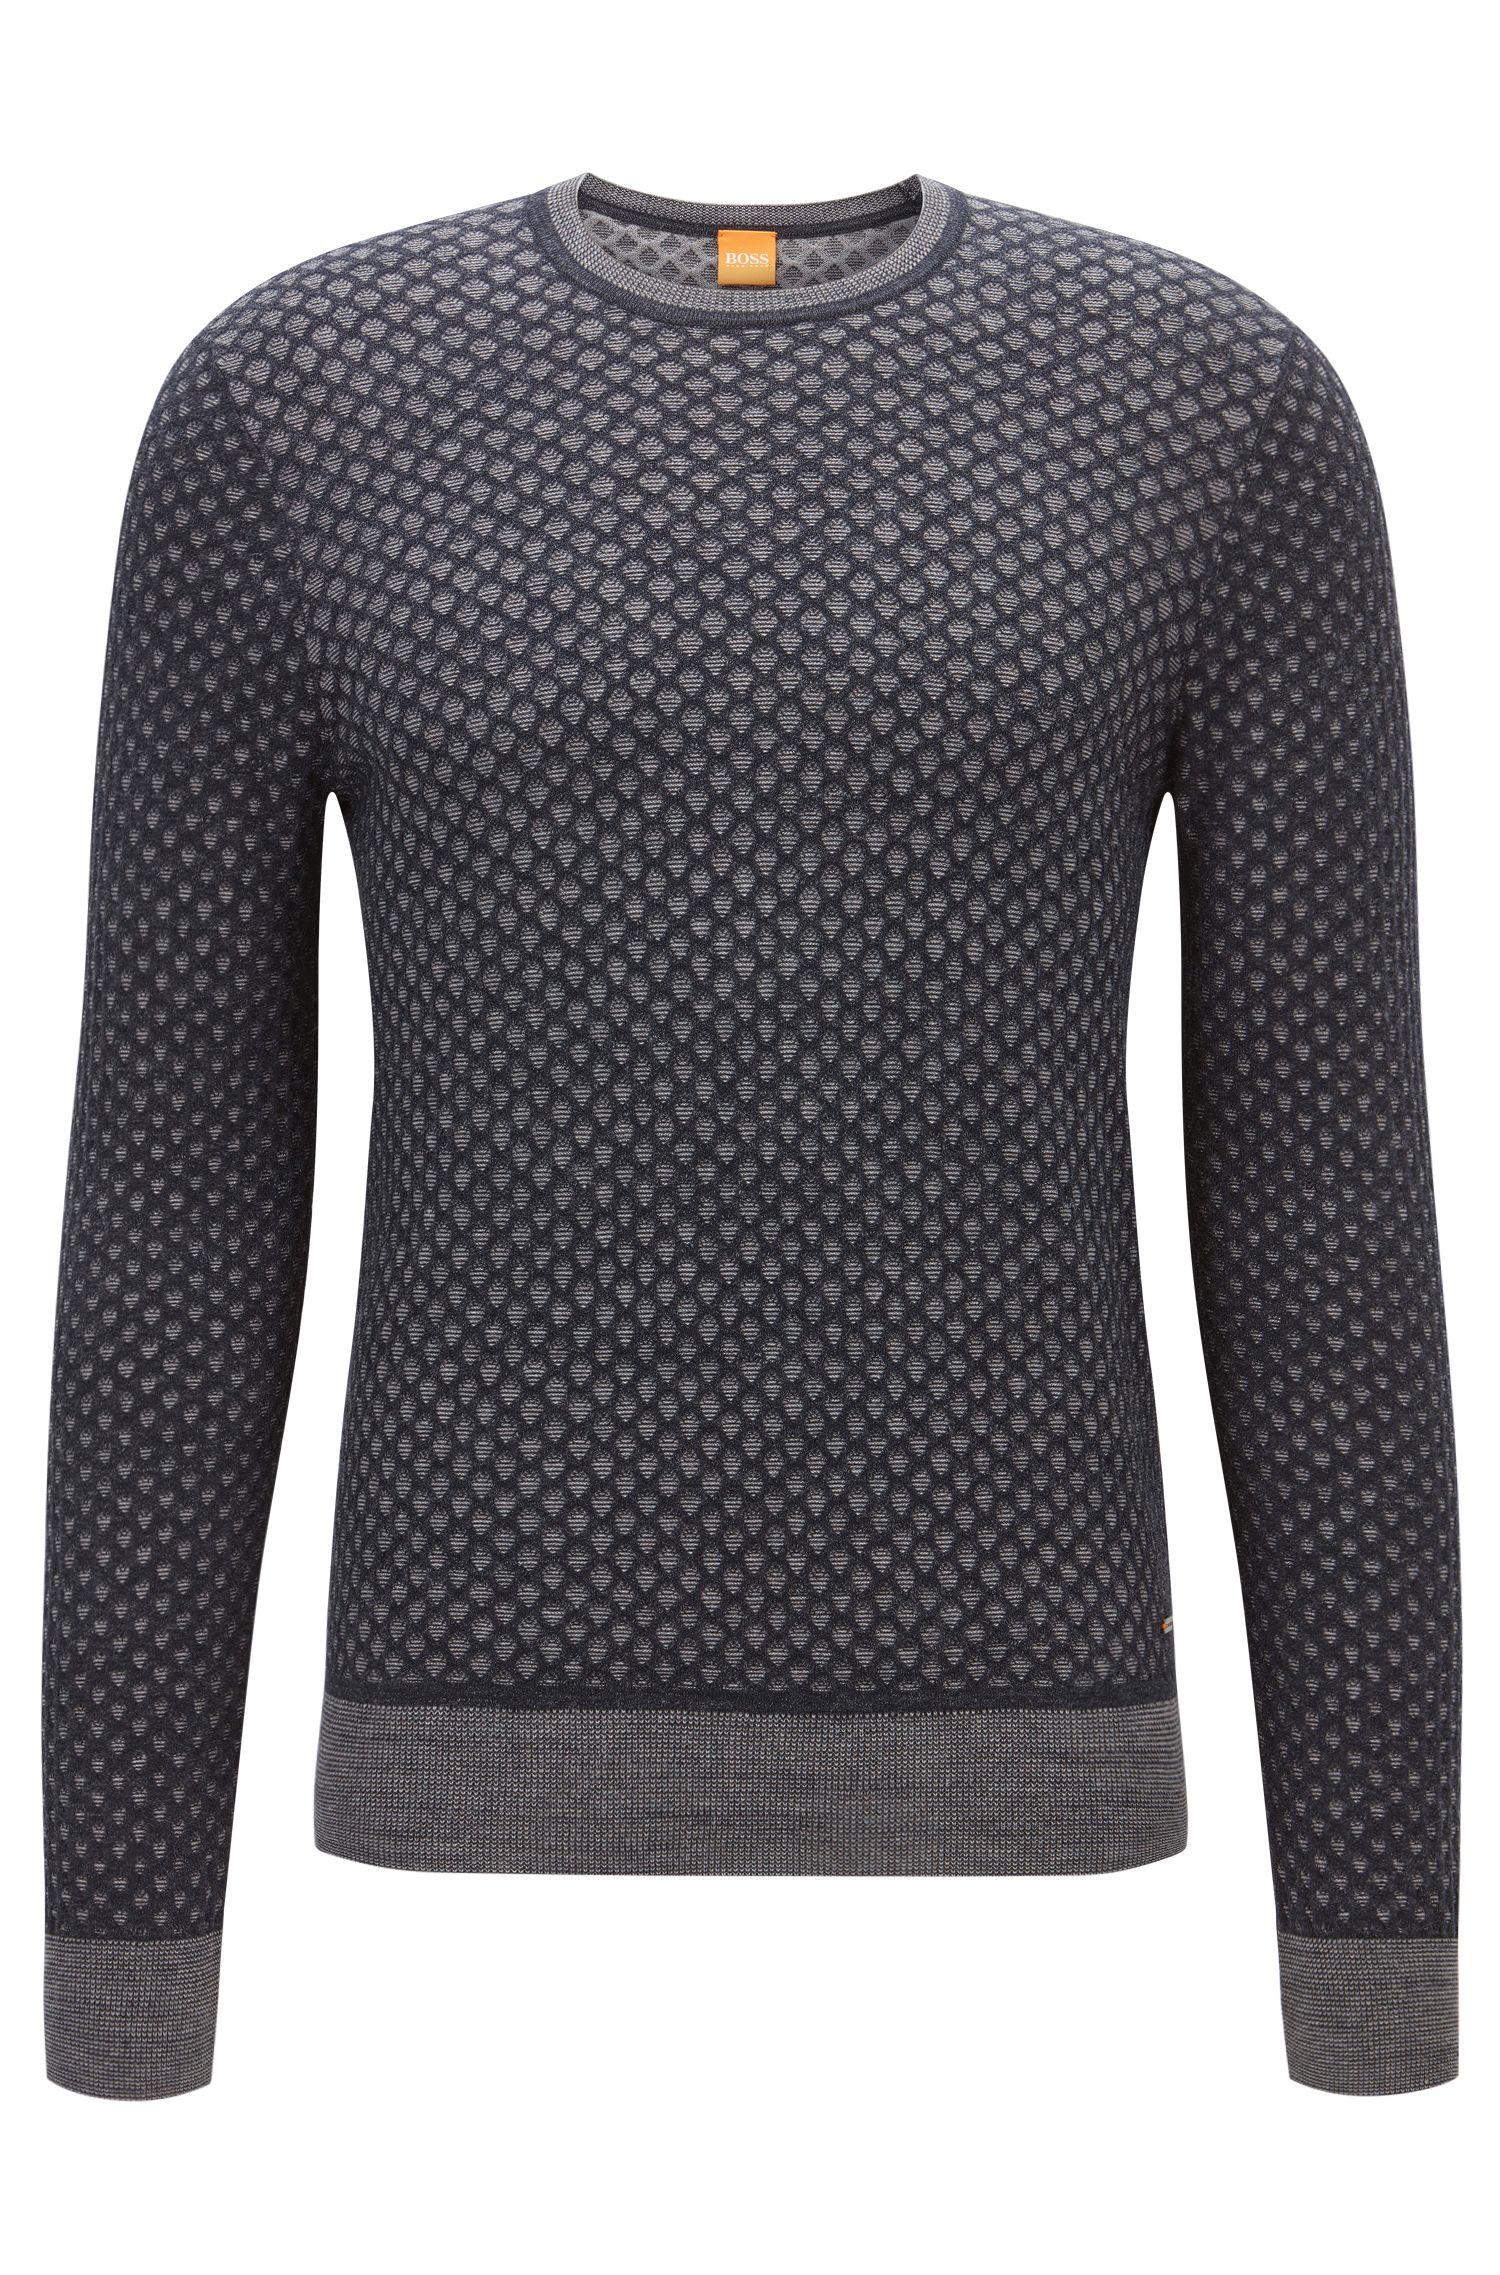 Dobby Cotton Sweater | Kewarco